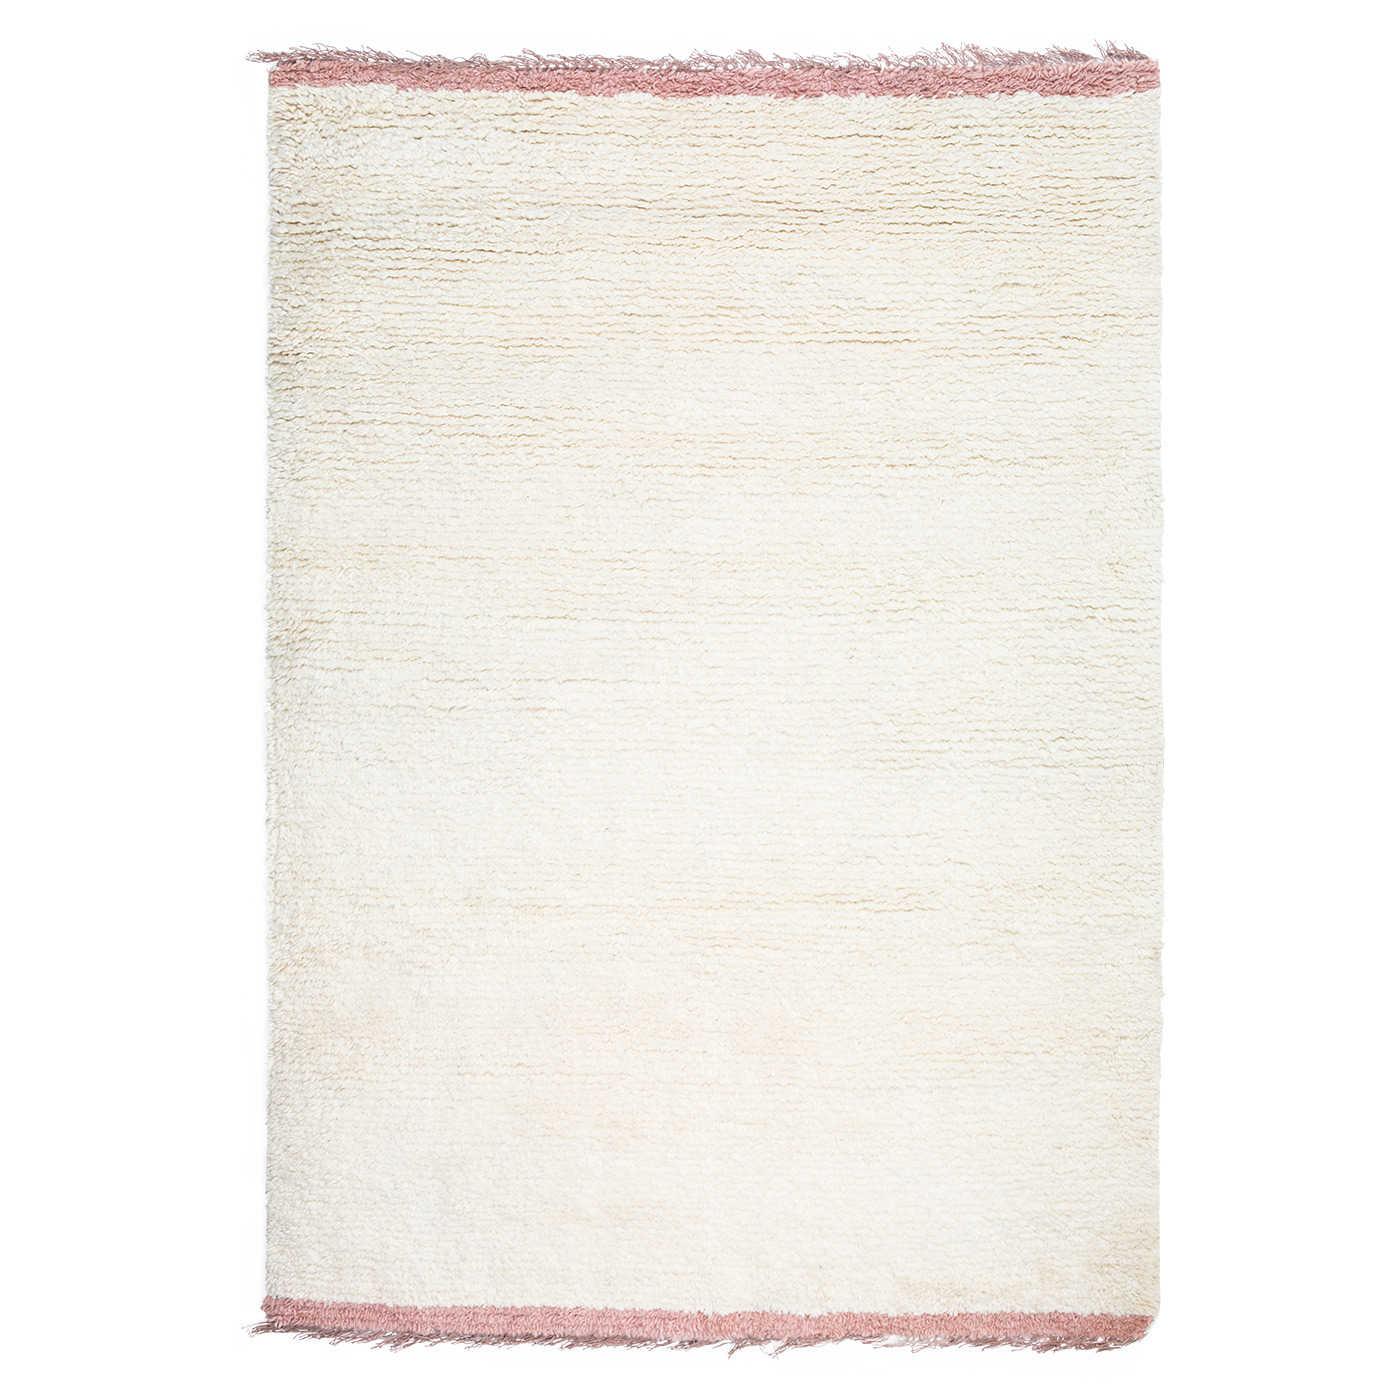 Segovia Rug White and Rose